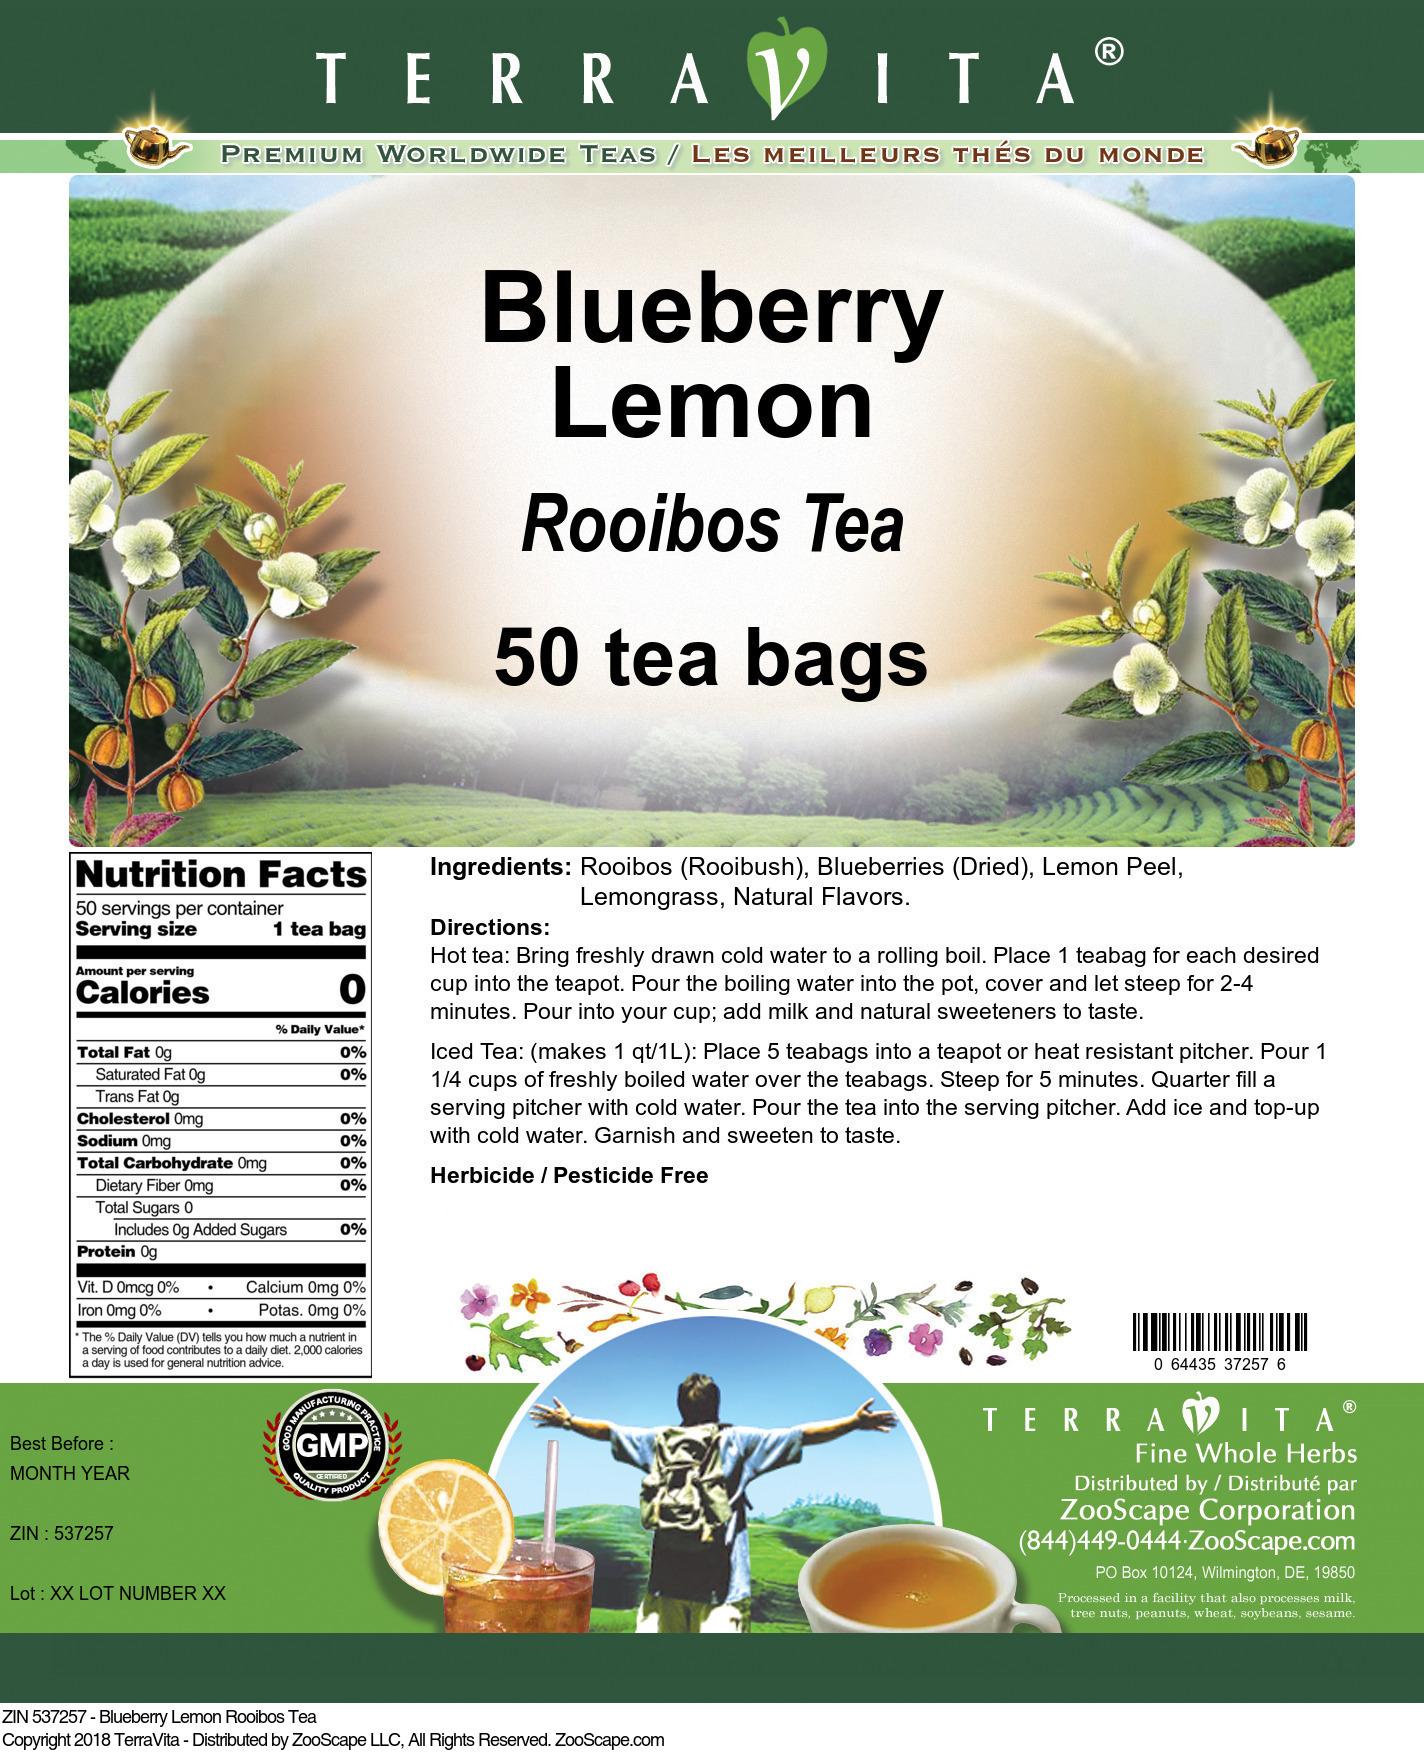 Blueberry Lemon Rooibos Tea